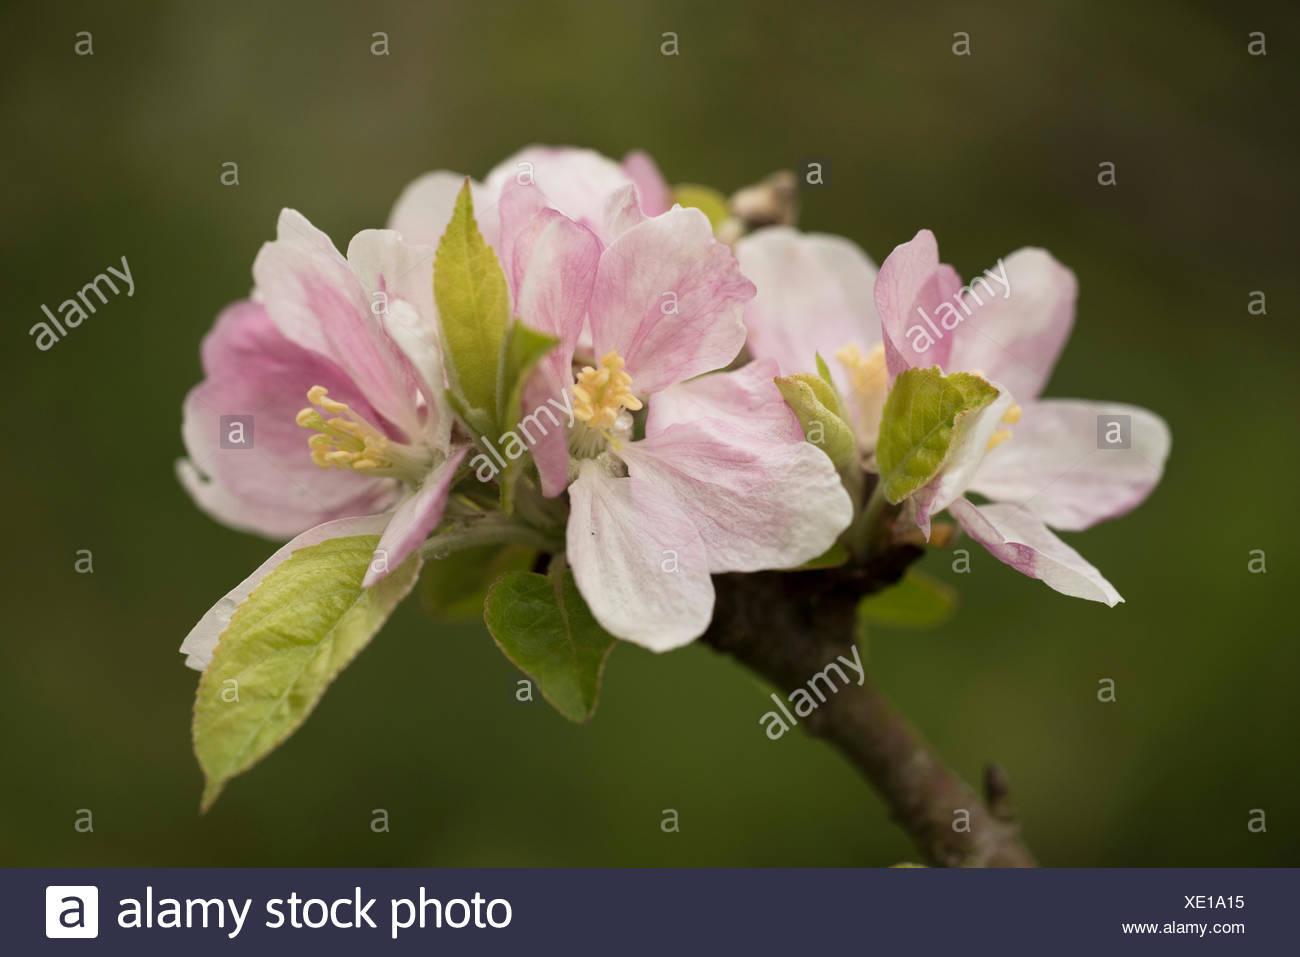 Cherry Tree Blossom Prunus serrulata UK - Stock Image